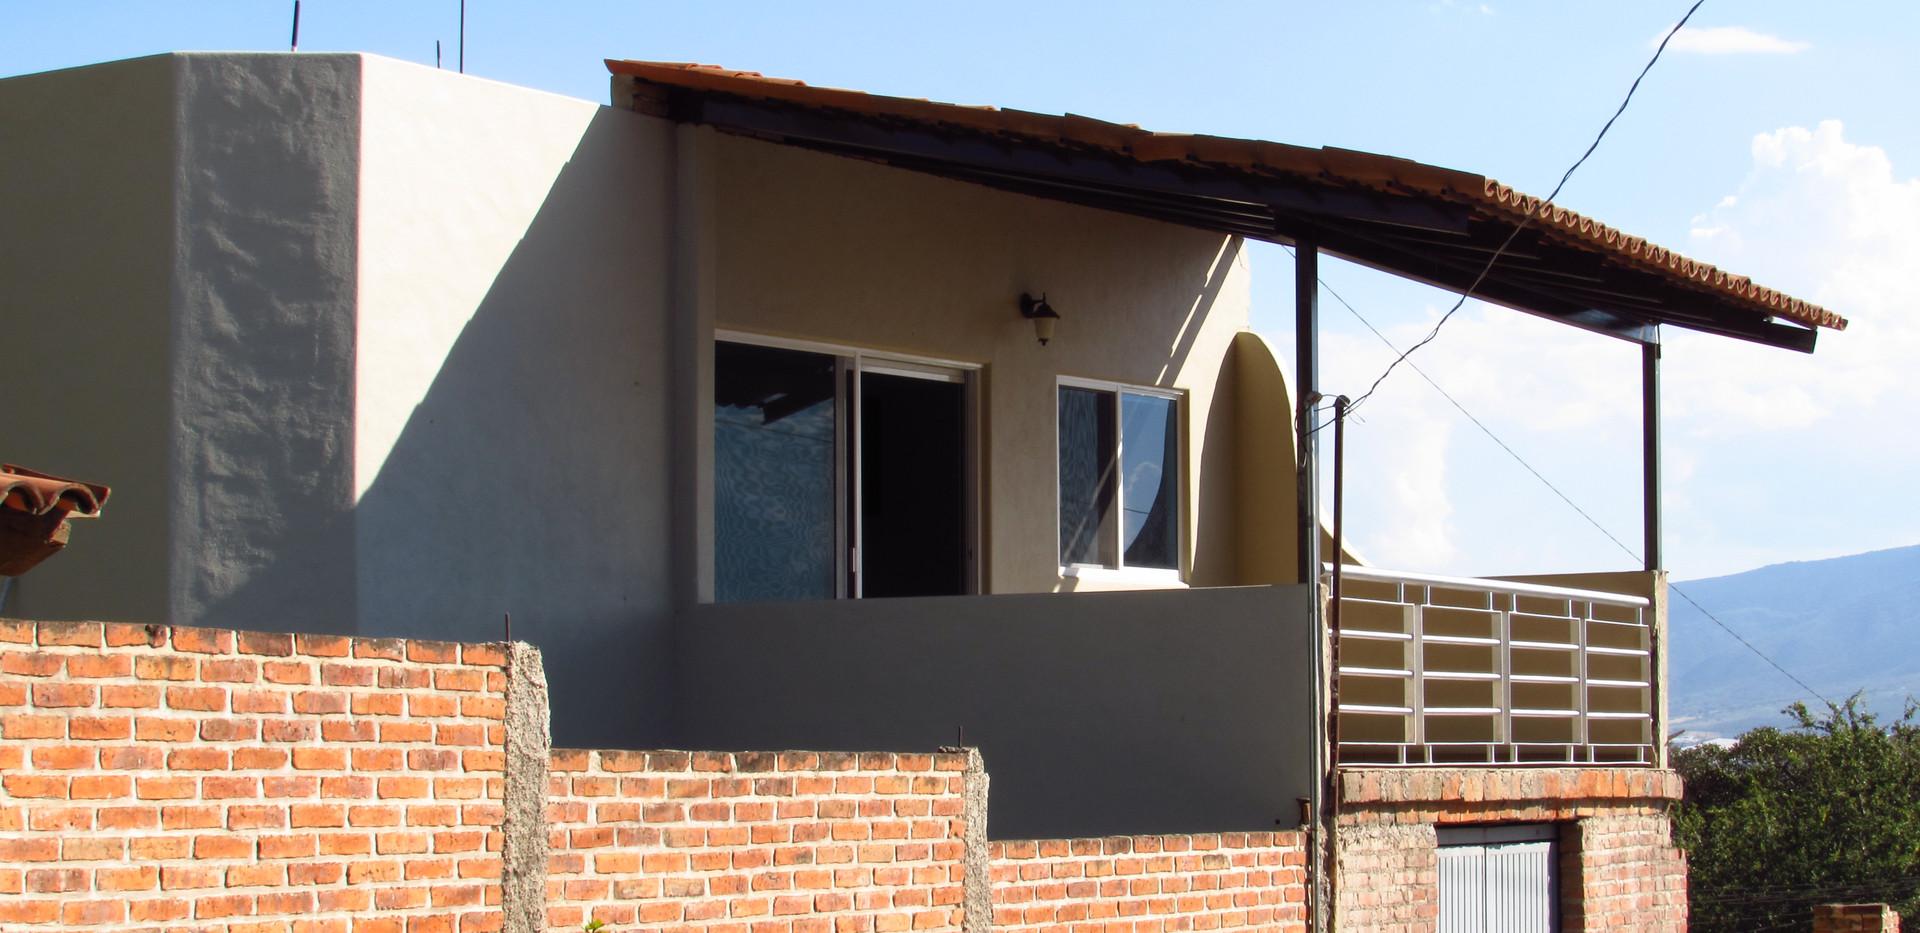 Cornejo's- Street view